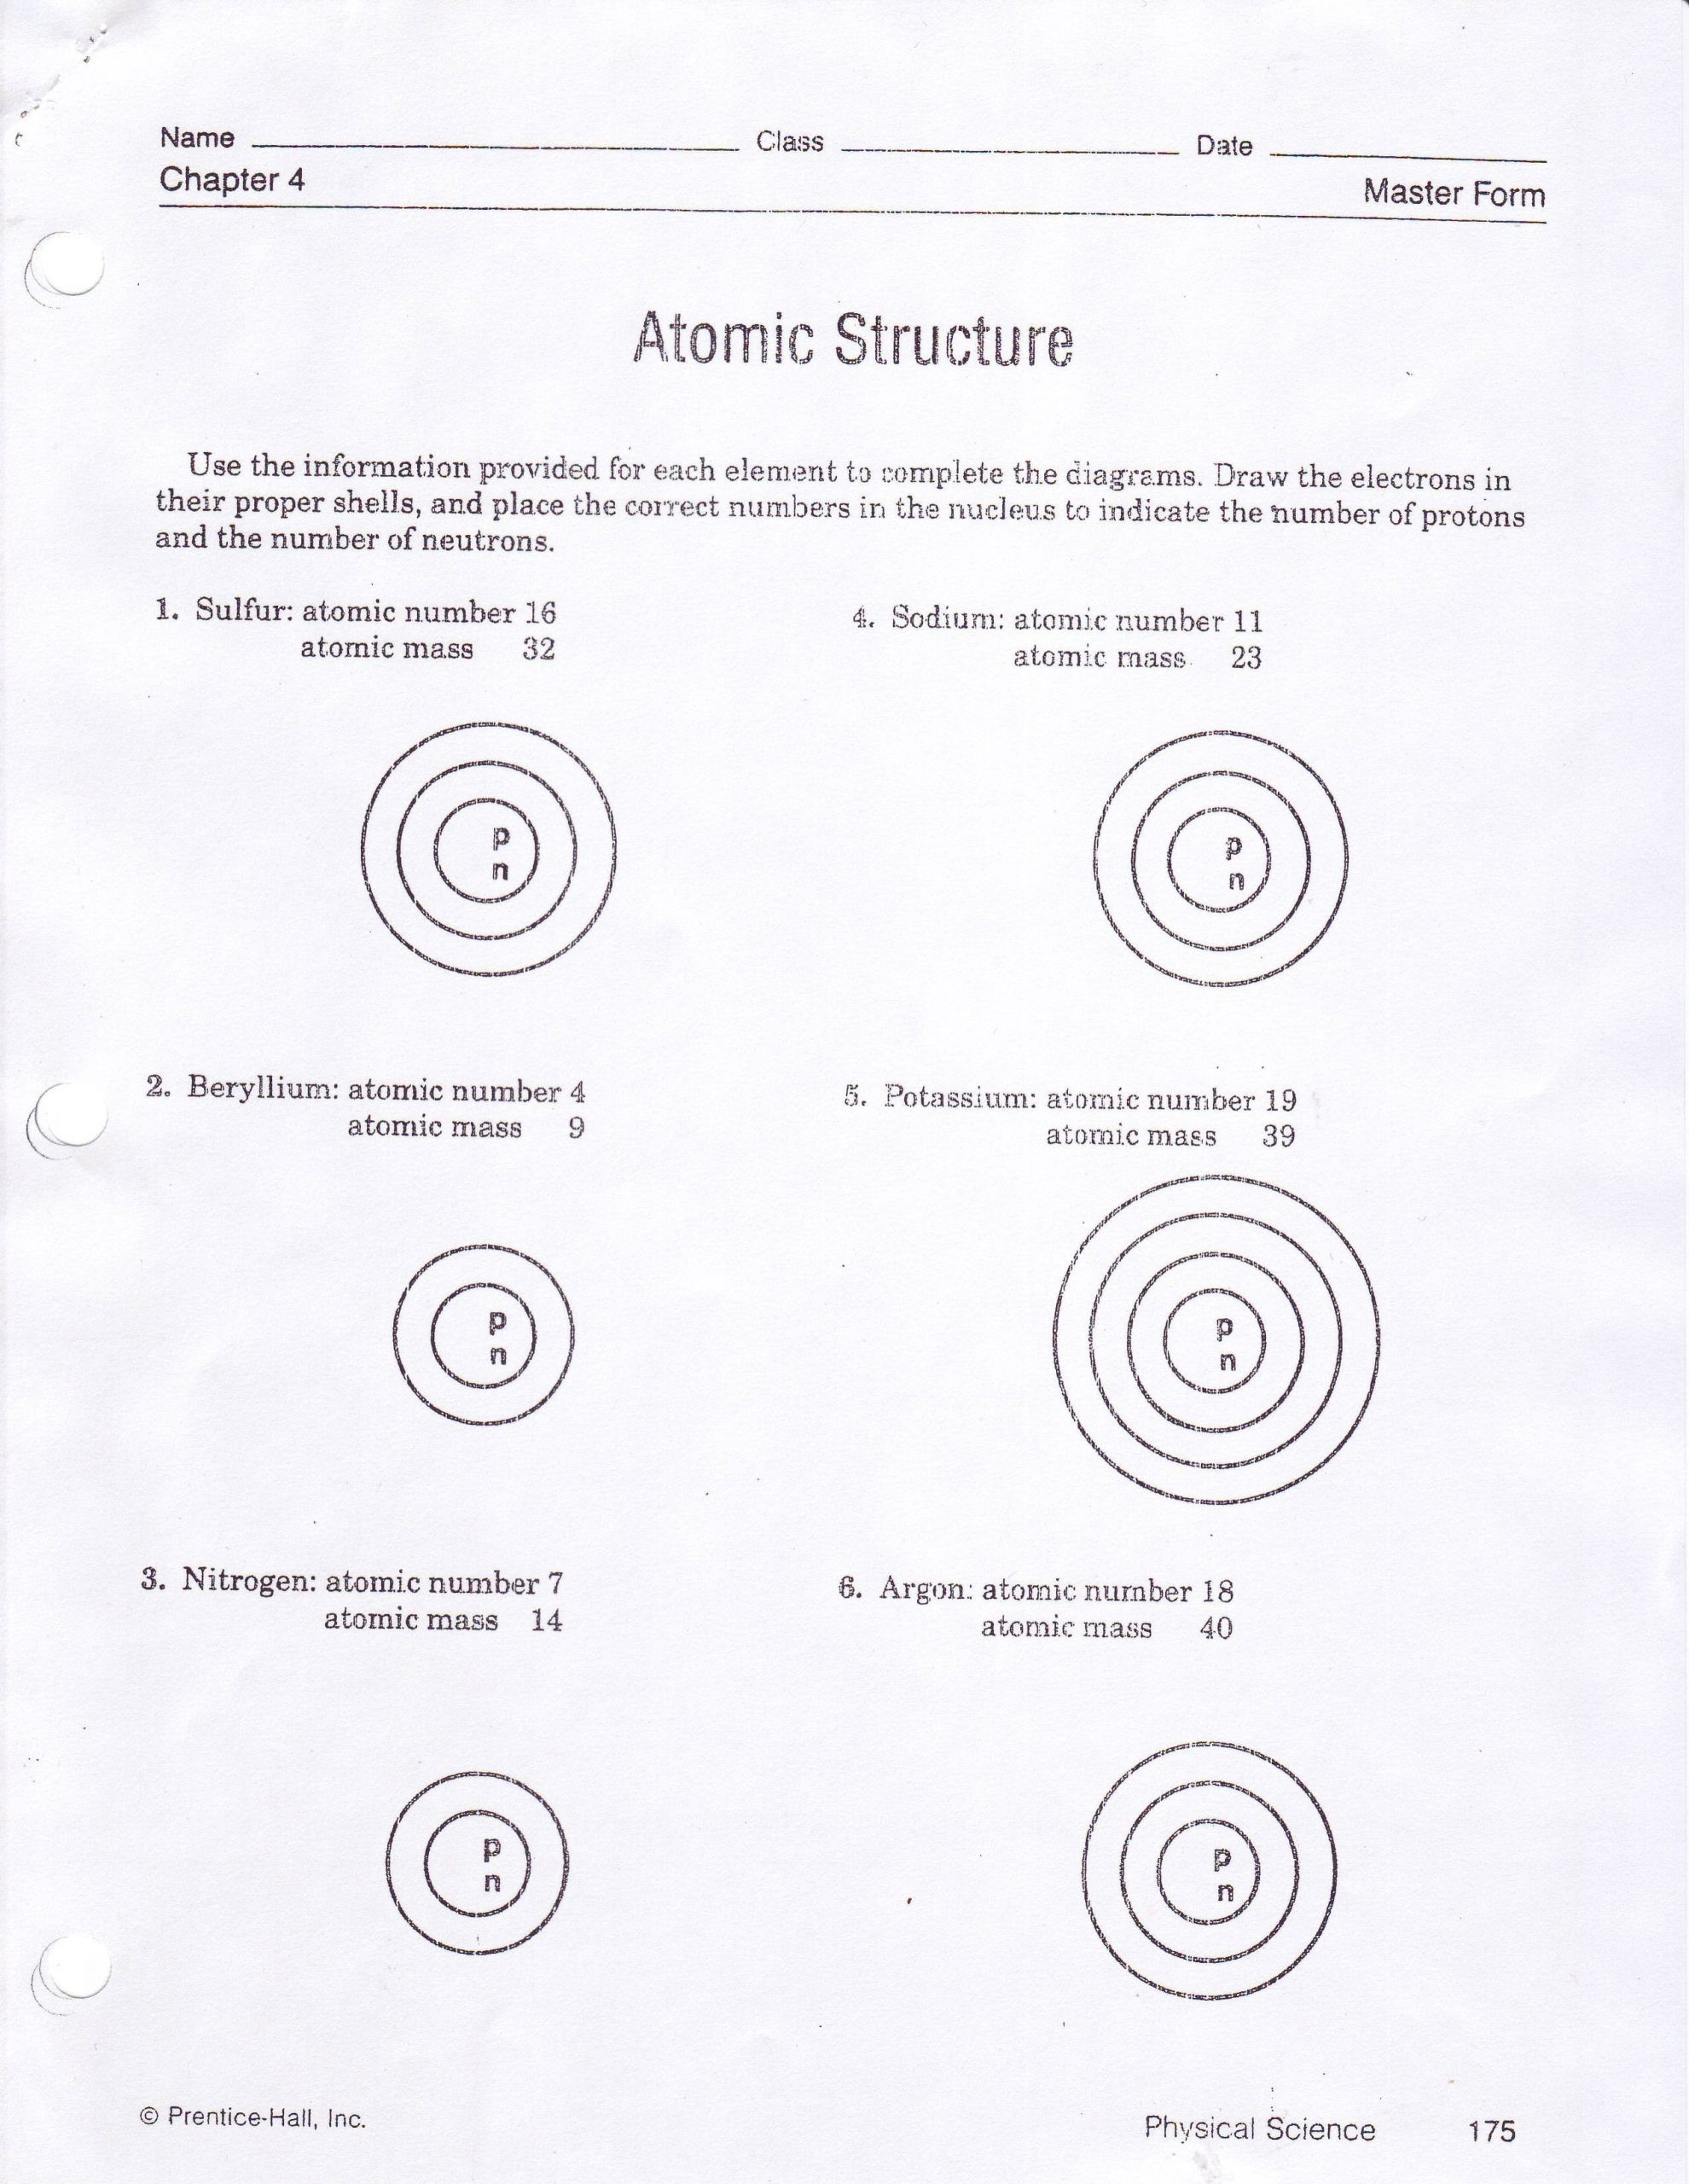 Atomic Structure Worksheet Answer Key Worksheets 42 astonishing atomic Structure Worksheet